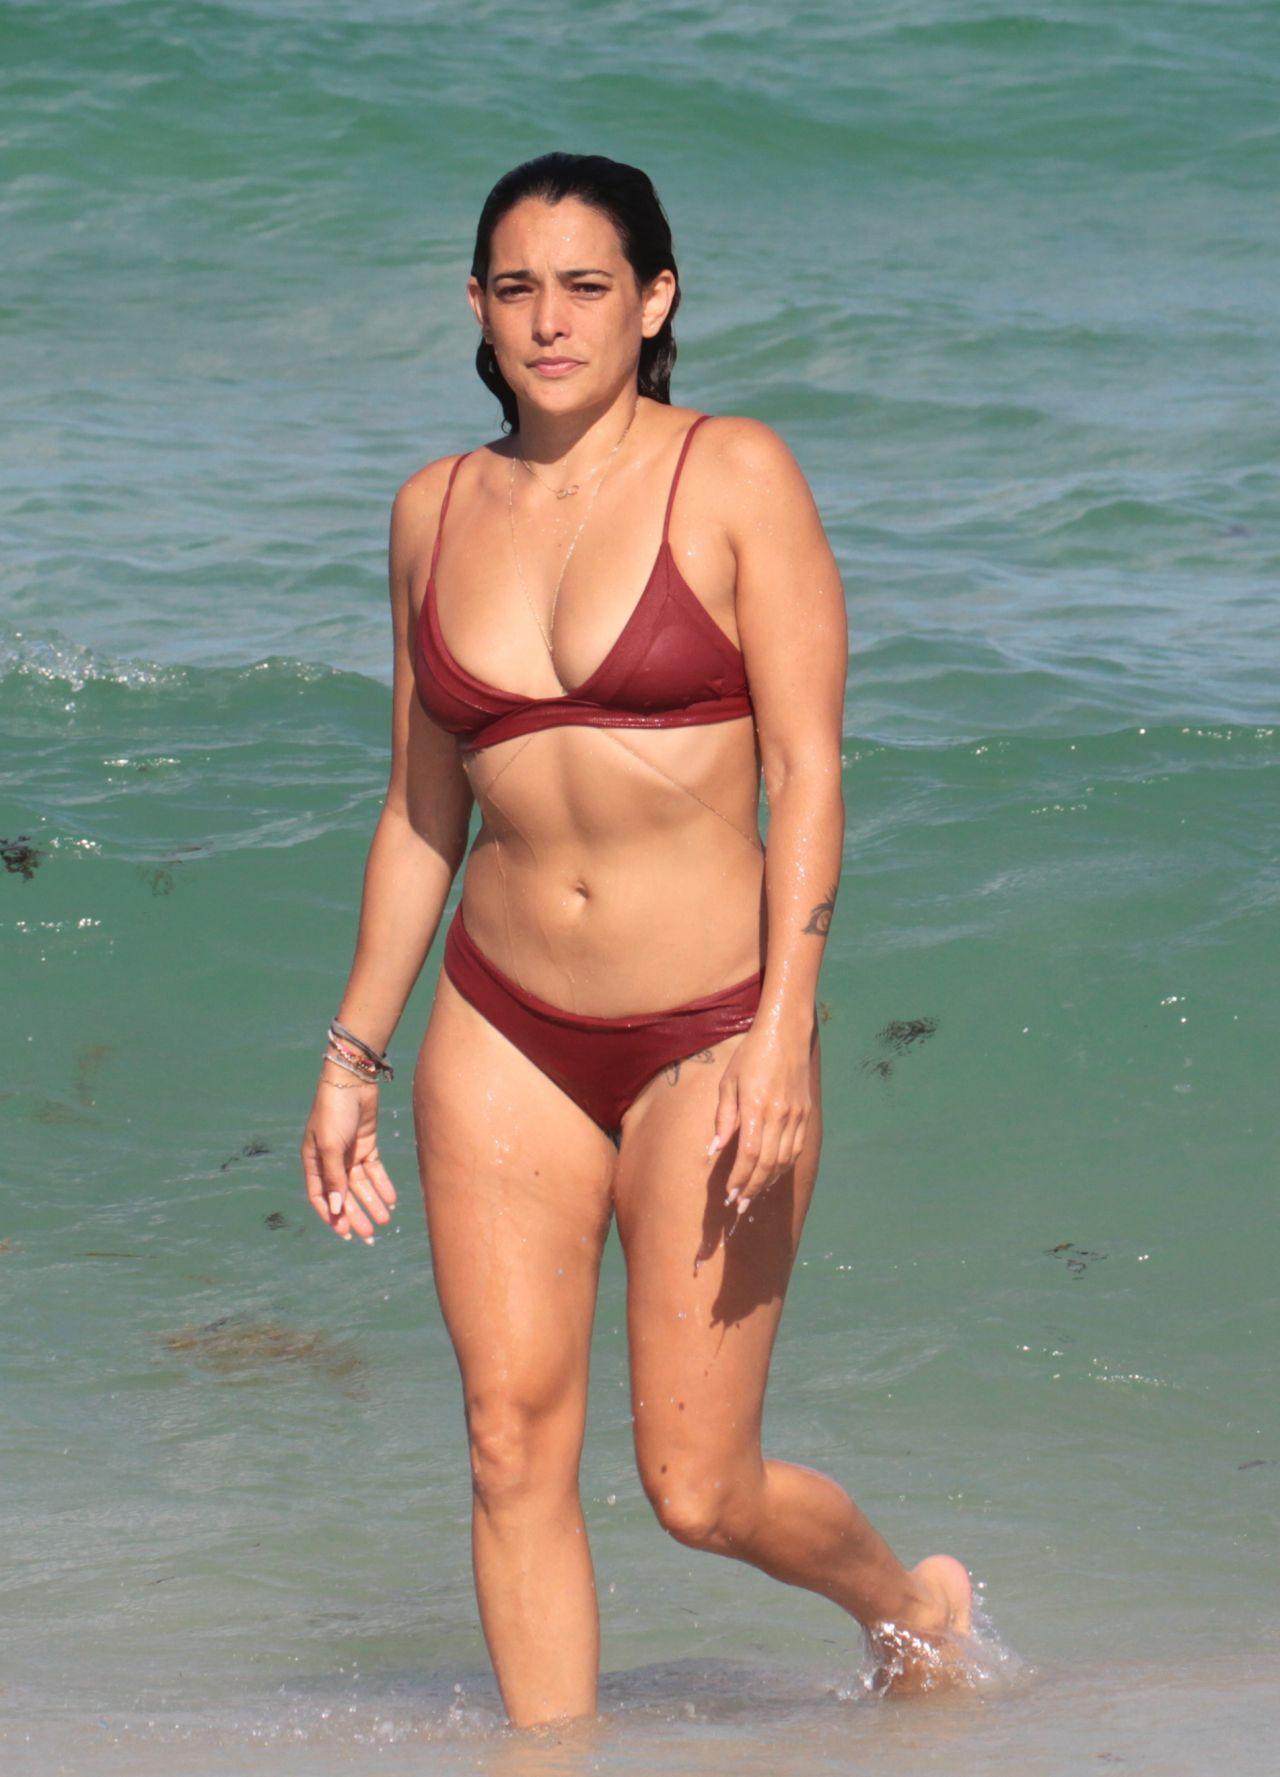 Natalie martinez in bikini miami beach florida nude (82 pictures)